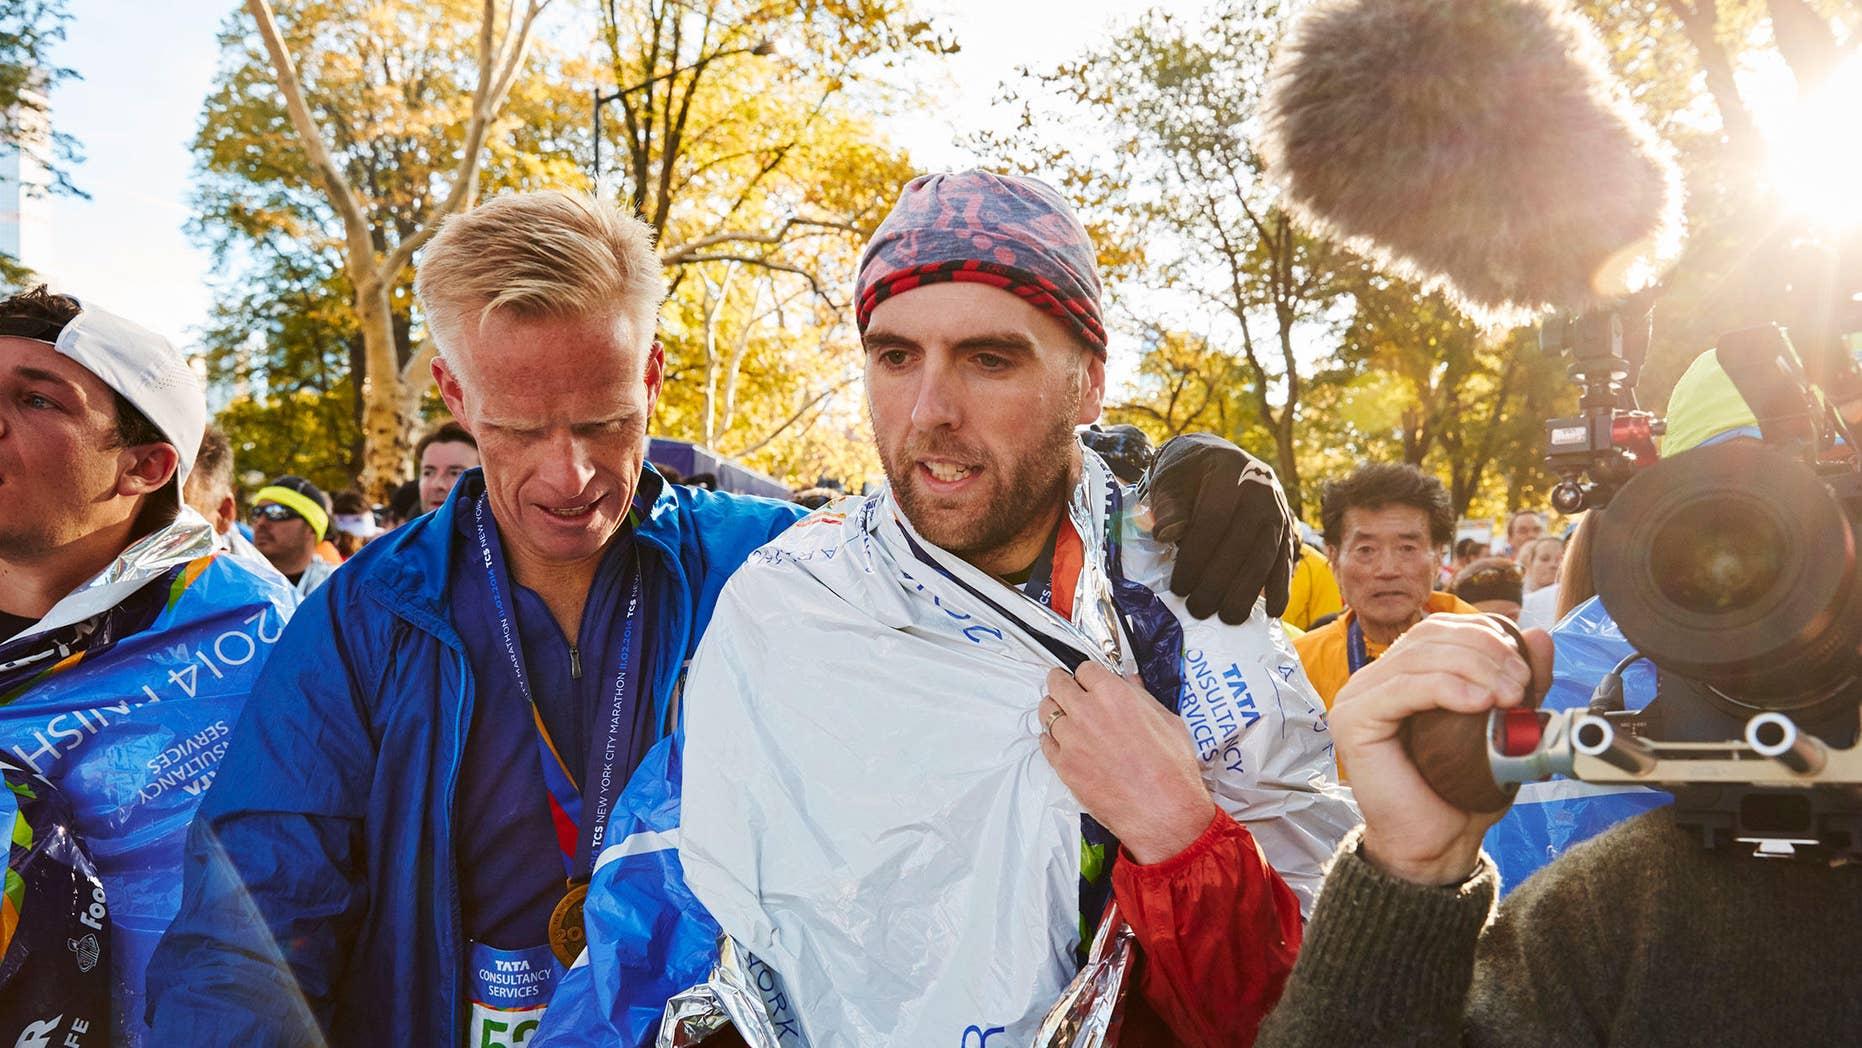 Simon Wheatcroft finished the 2014 New York City Marathon in 5:13:18. PHOTOGRAPH COURTESY OF SIMON WHEATCROFT